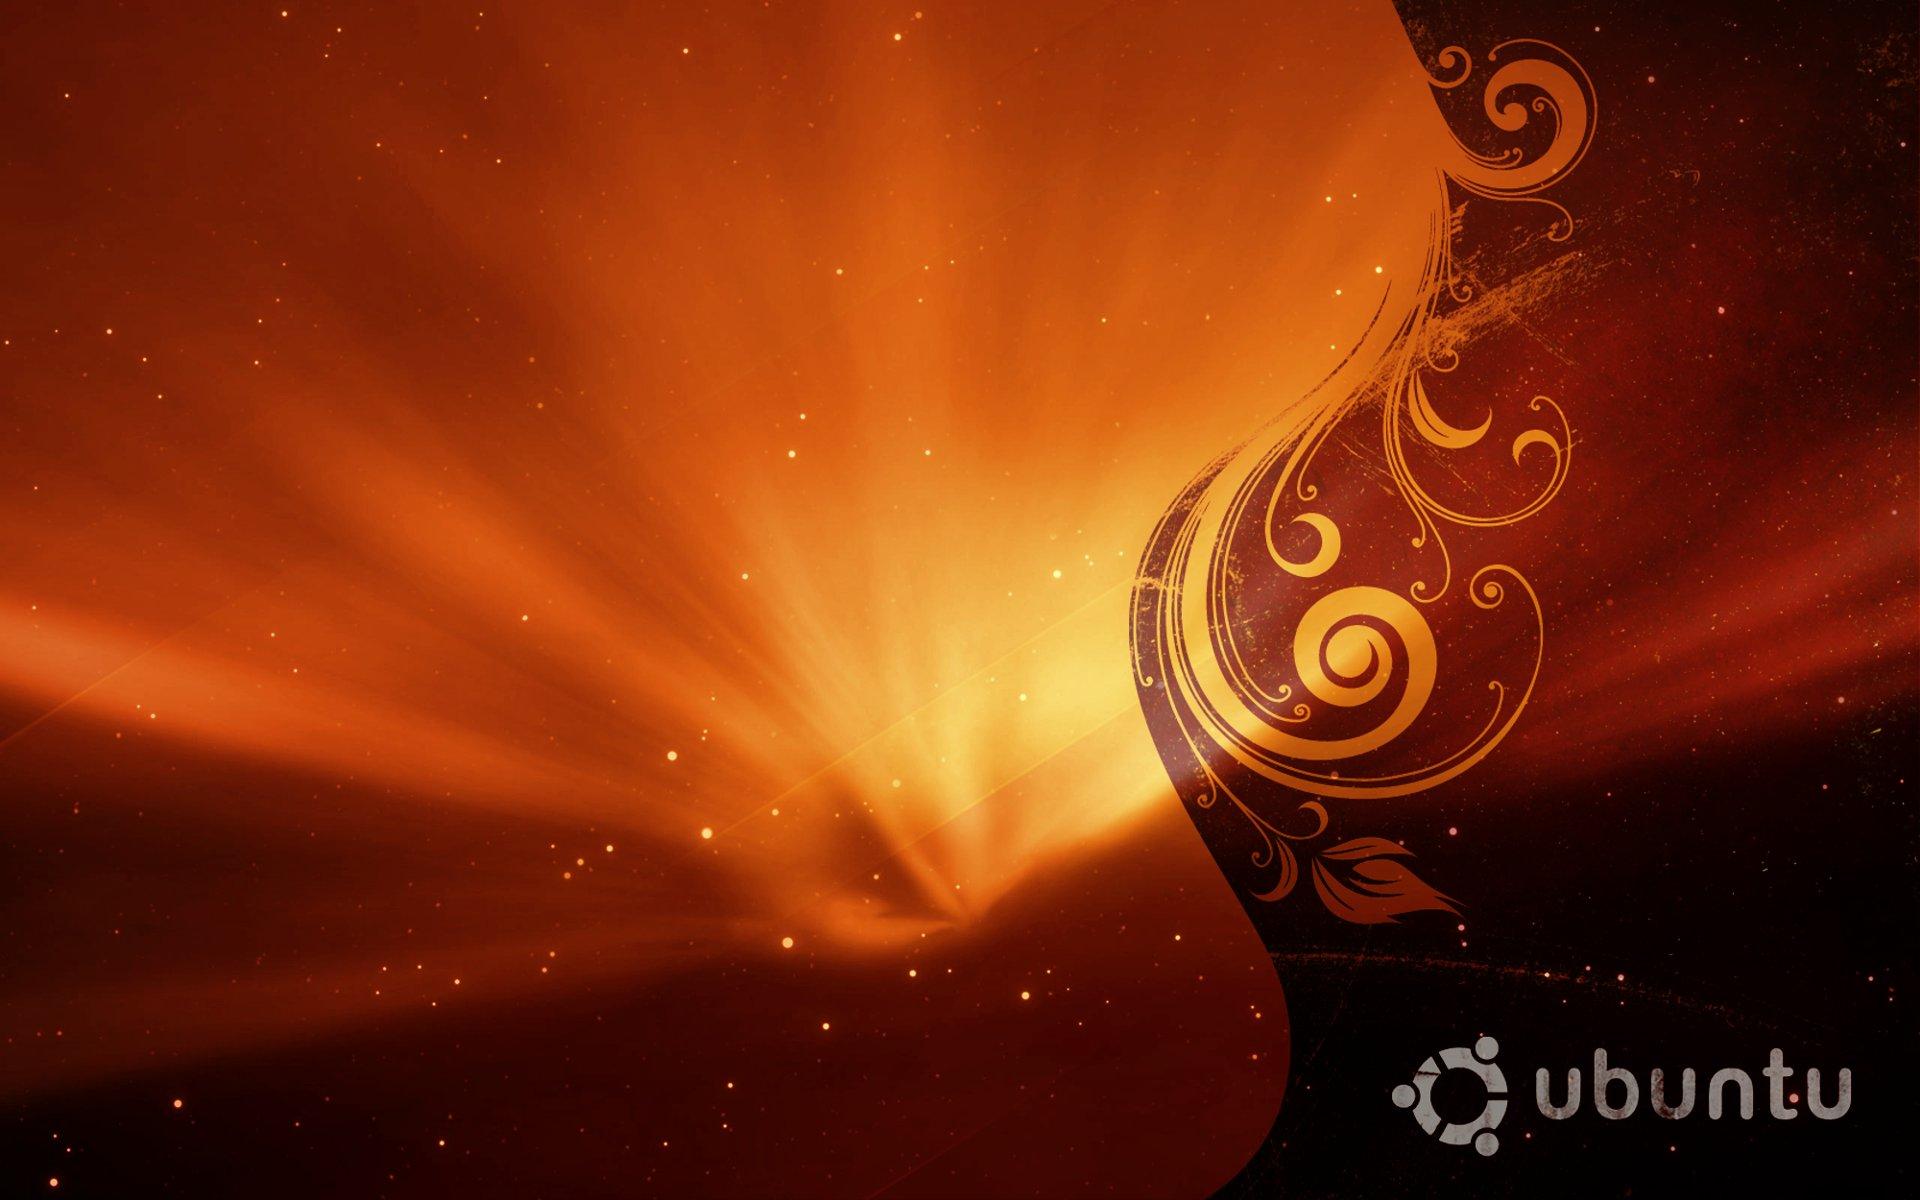 Ubuntu wallpaper   796762 1920x1200